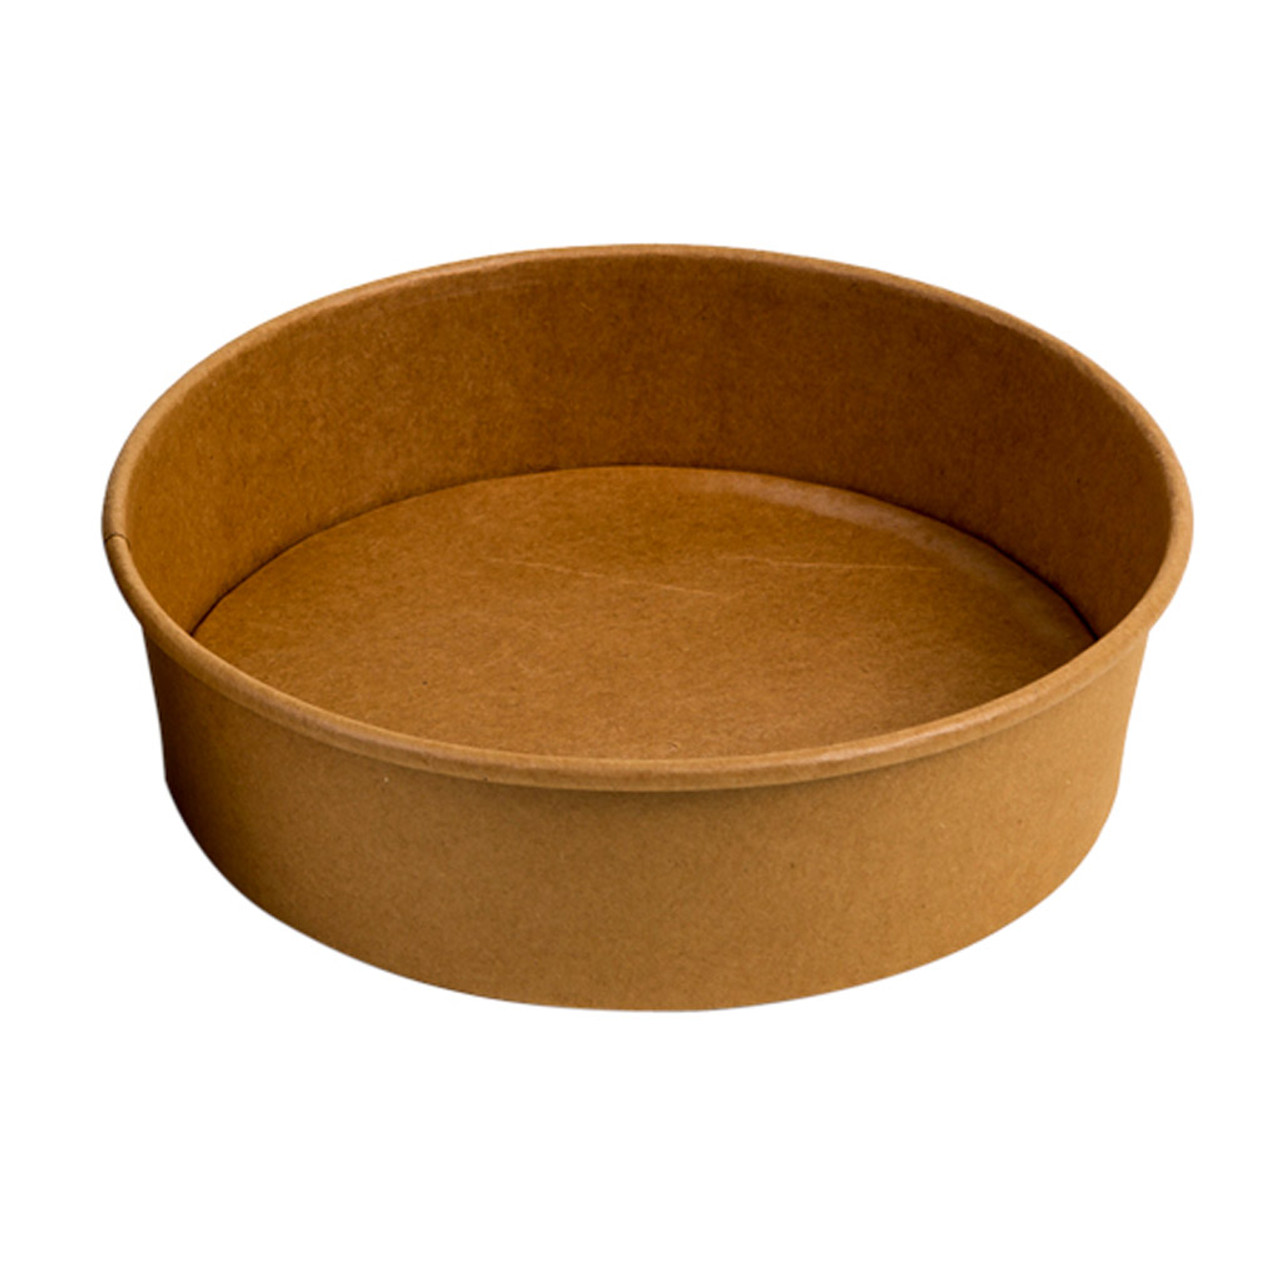 26oz Kraft Bowl